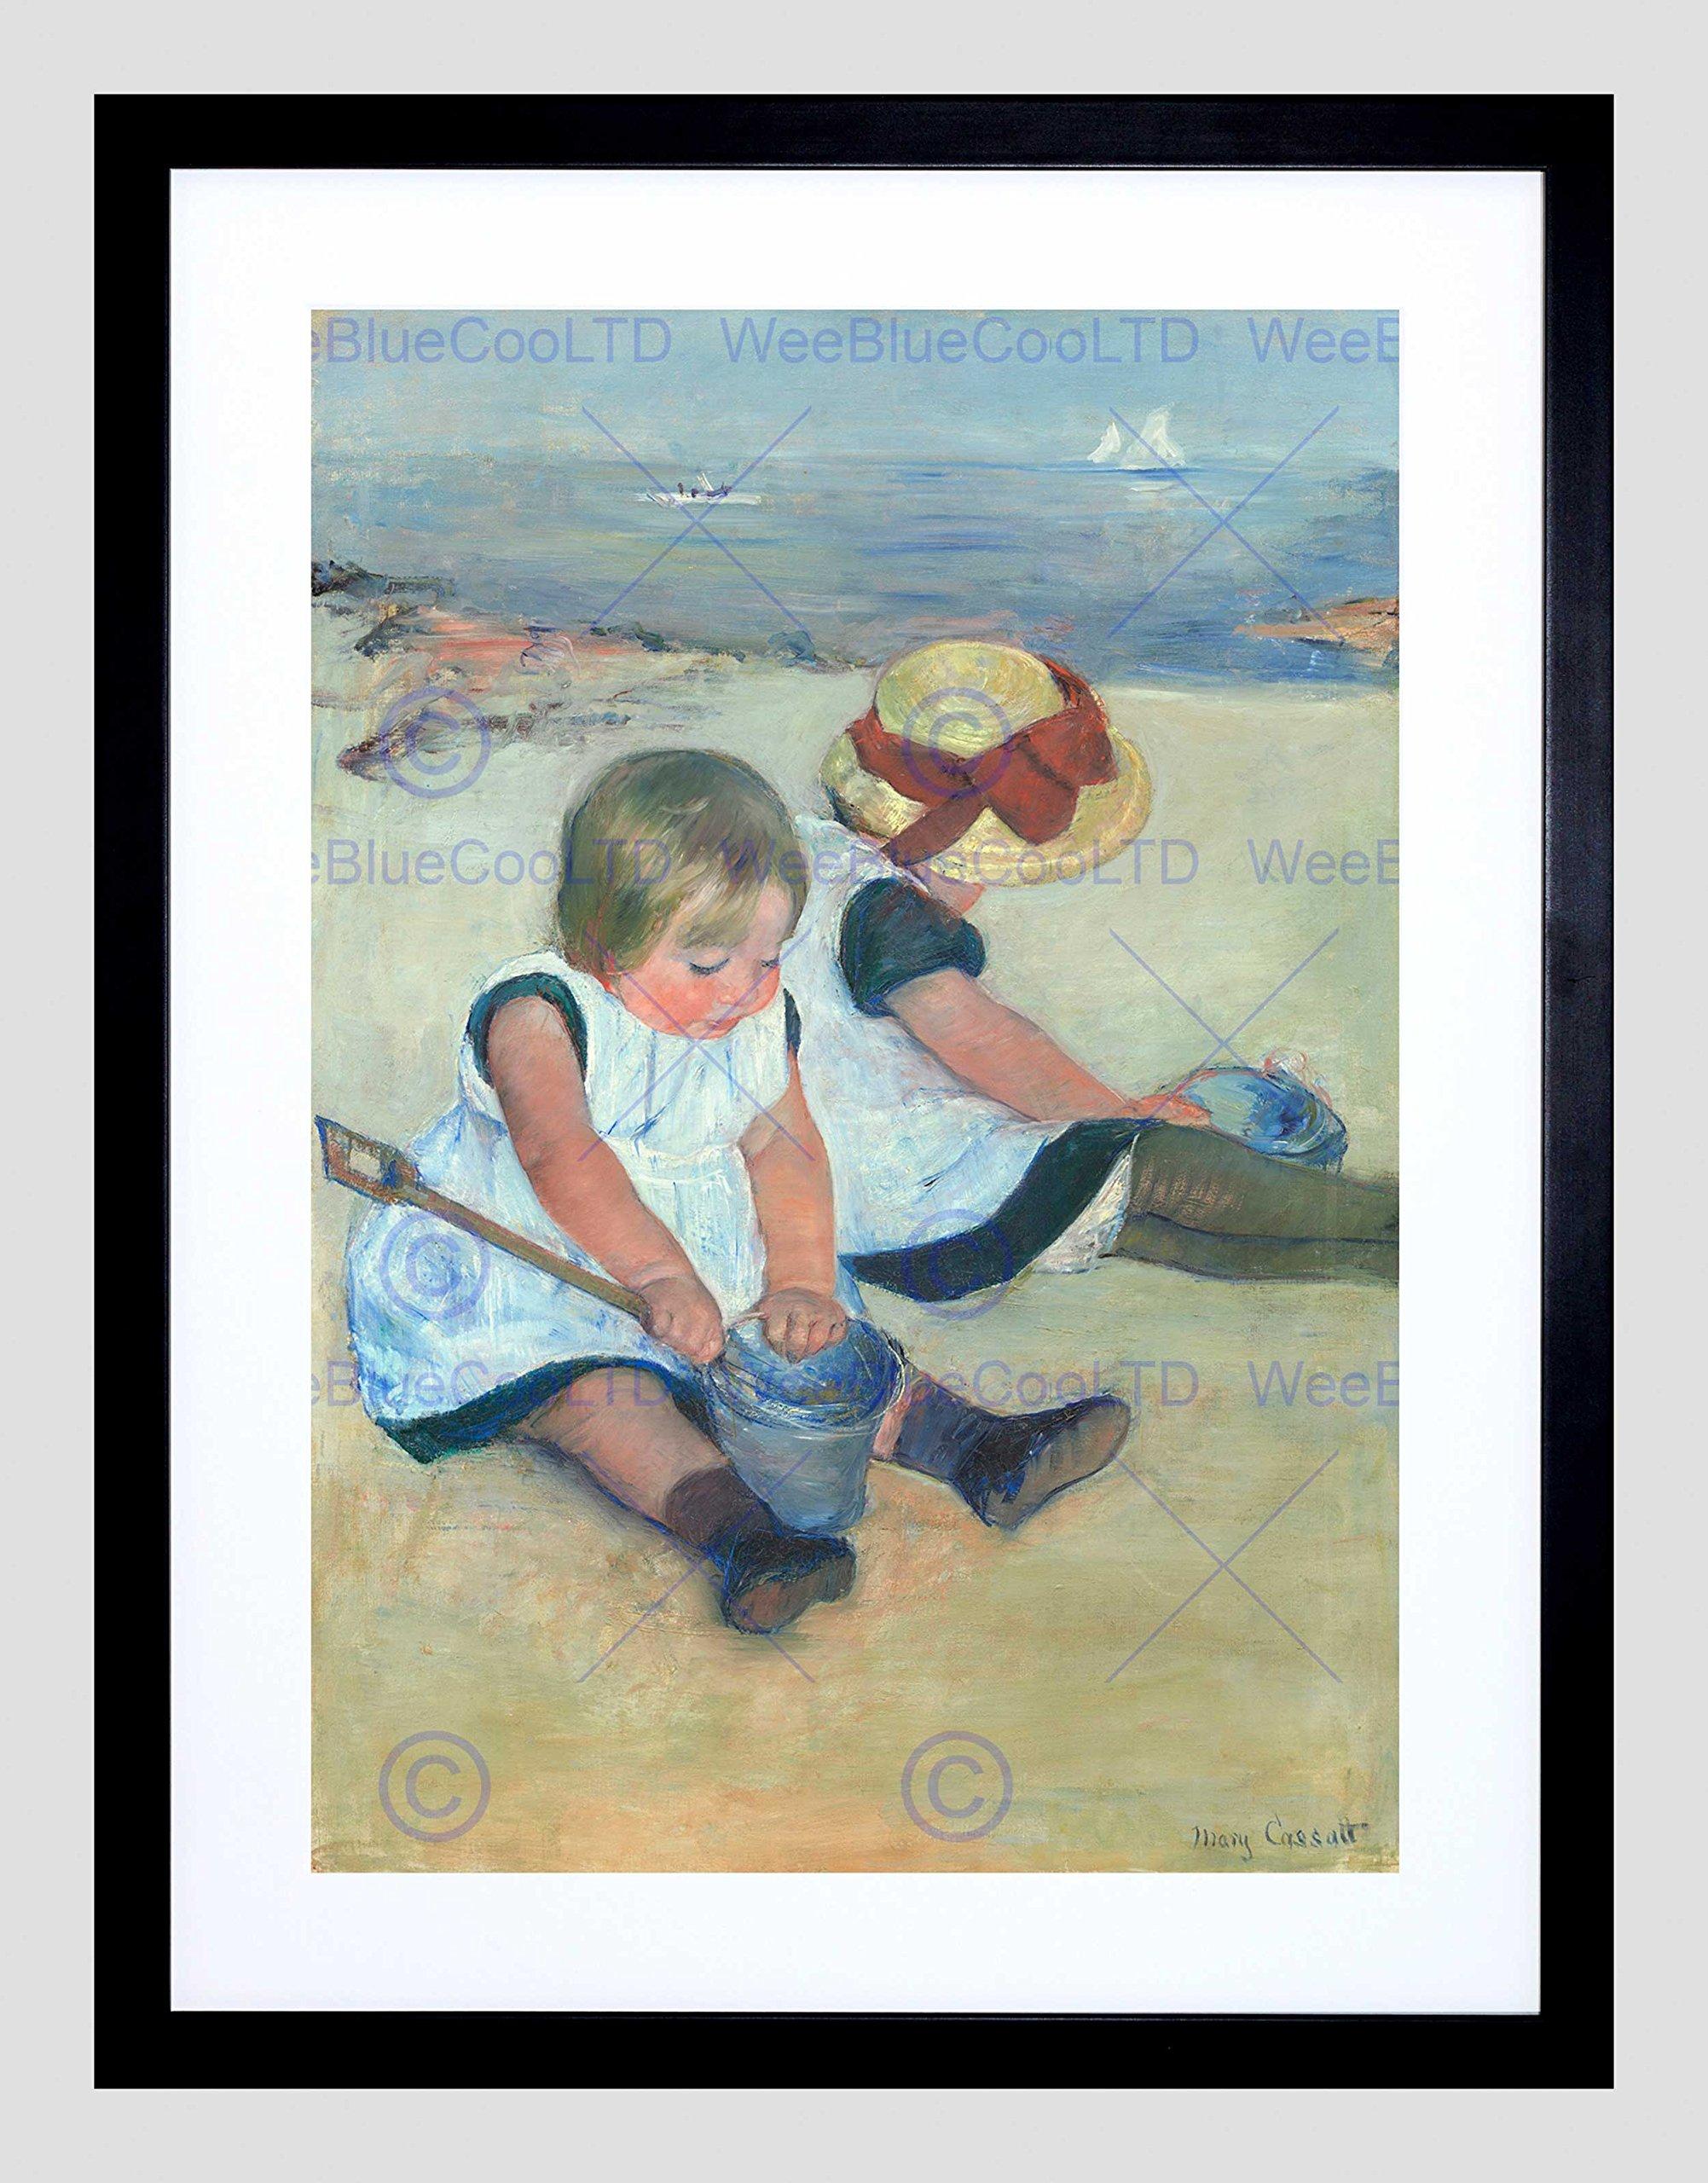 MARY CASSATT AMERICAN CHILDREN PLAYING BEACH BLACK FRAME FRAMED ART PRINT PICTURE + MOUNT B12X5373